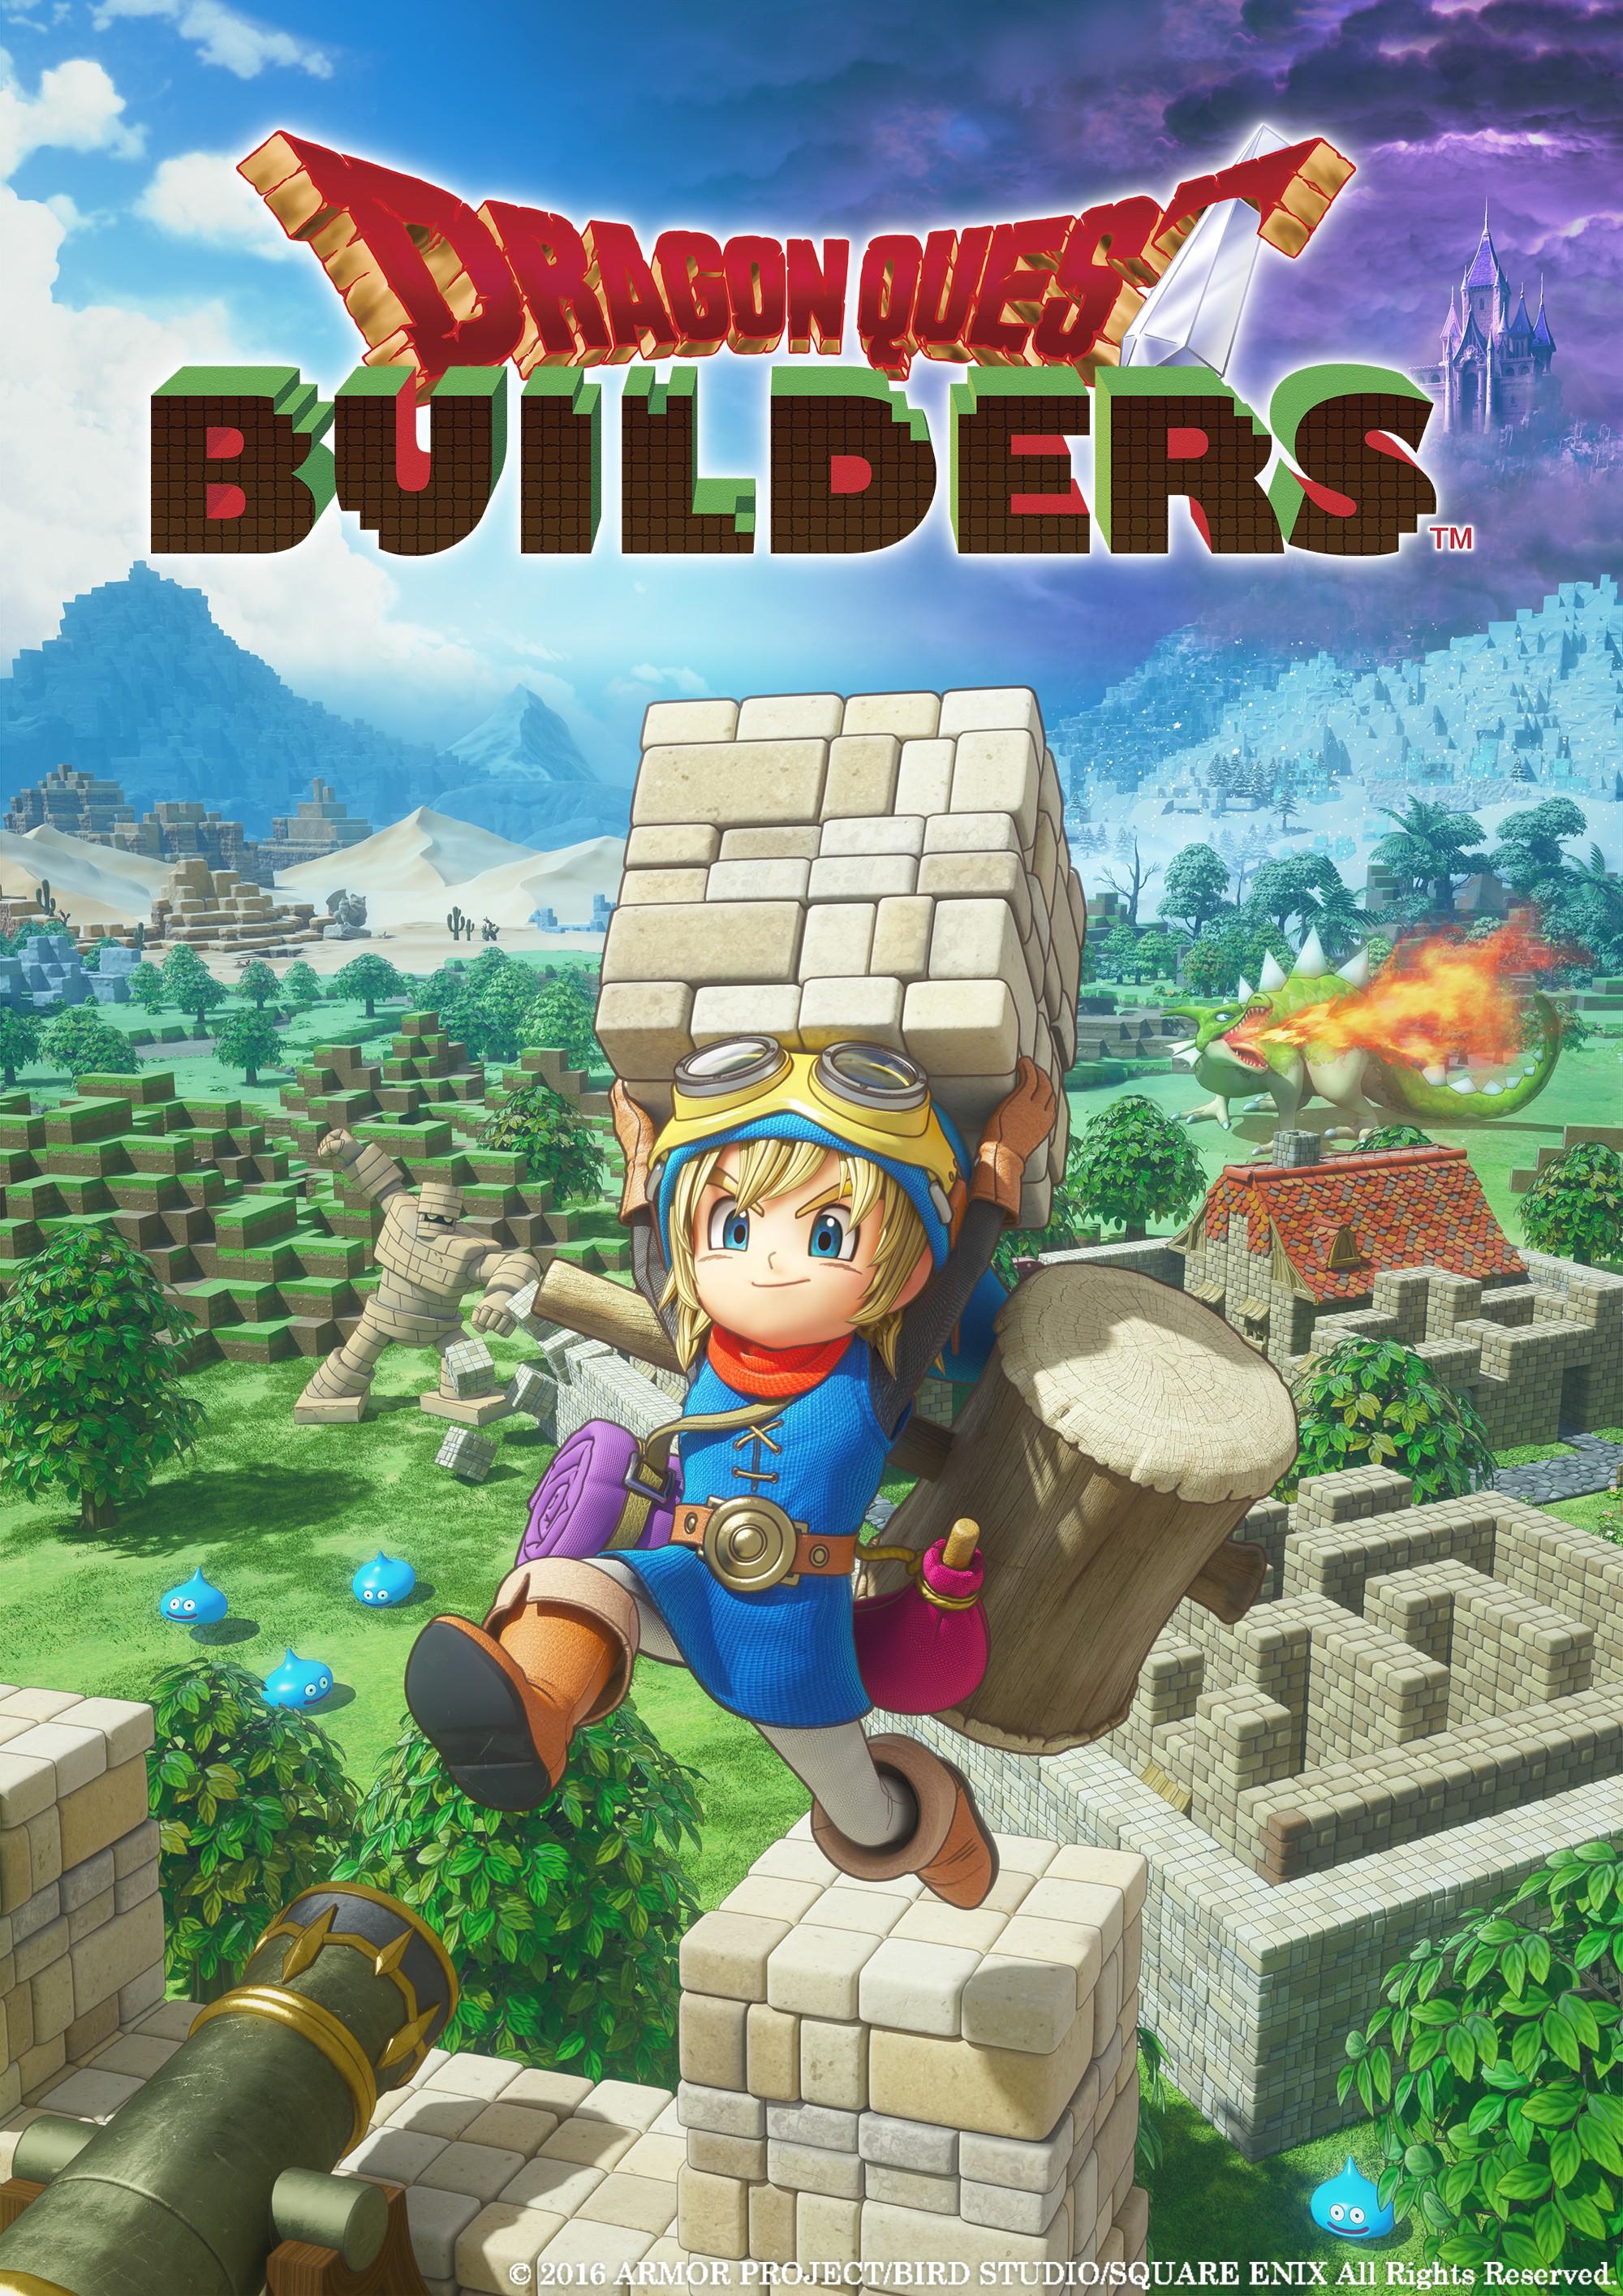 Dragon Quest Builders: How to Unlock Doors in Chapter 2 by